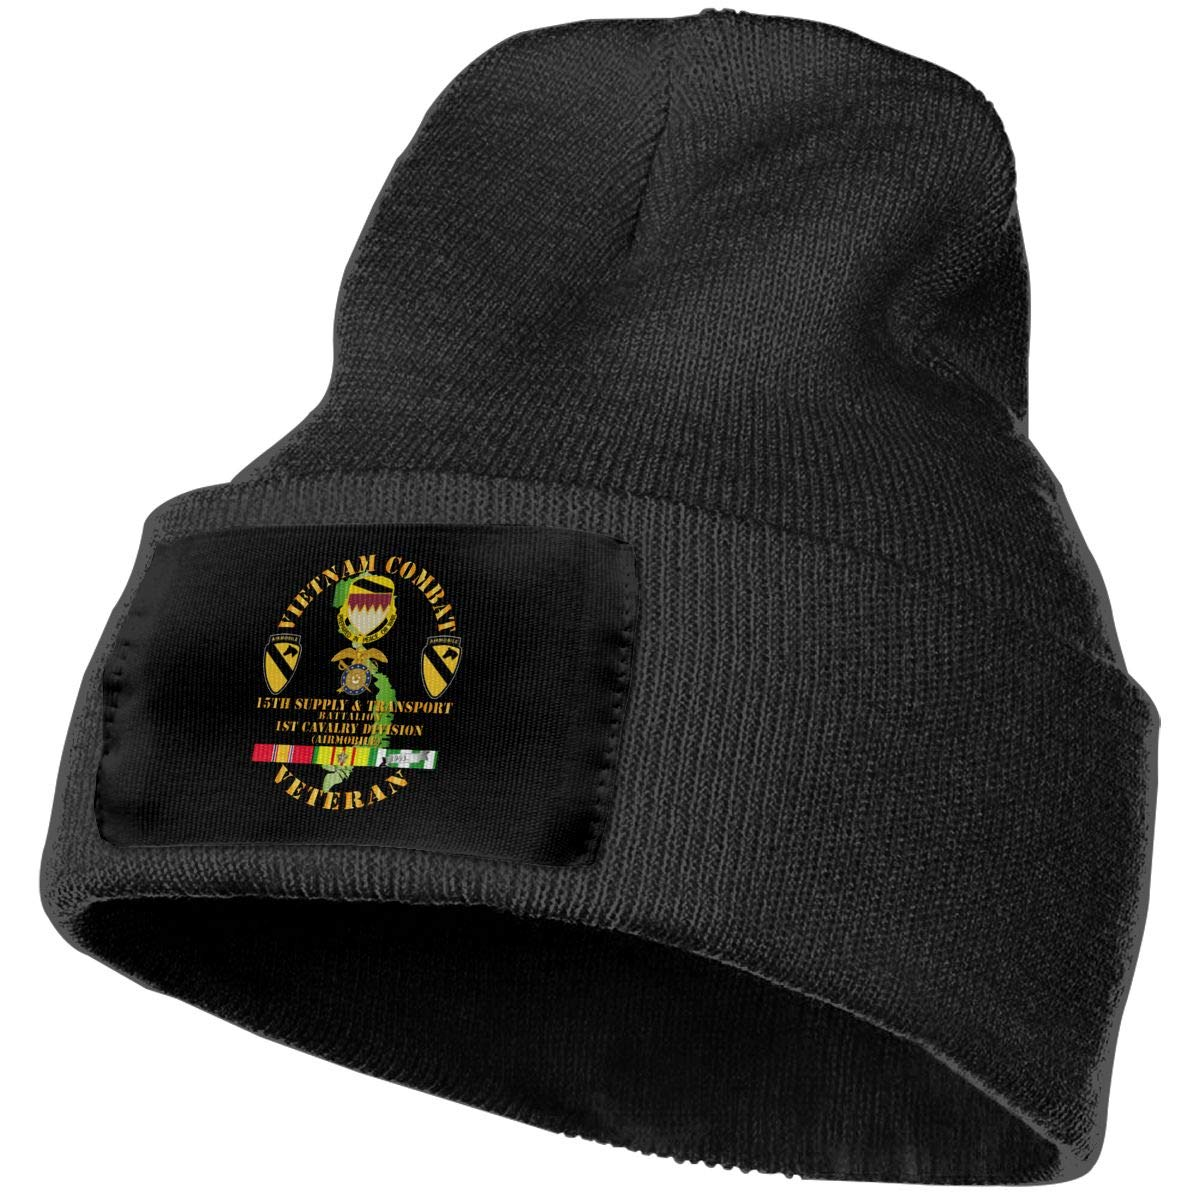 DFKD JKFD Unisex 3D Knitted Hat Skull Hat Beanie Cap Vietnam Combat Cavalry Veteran W 15th